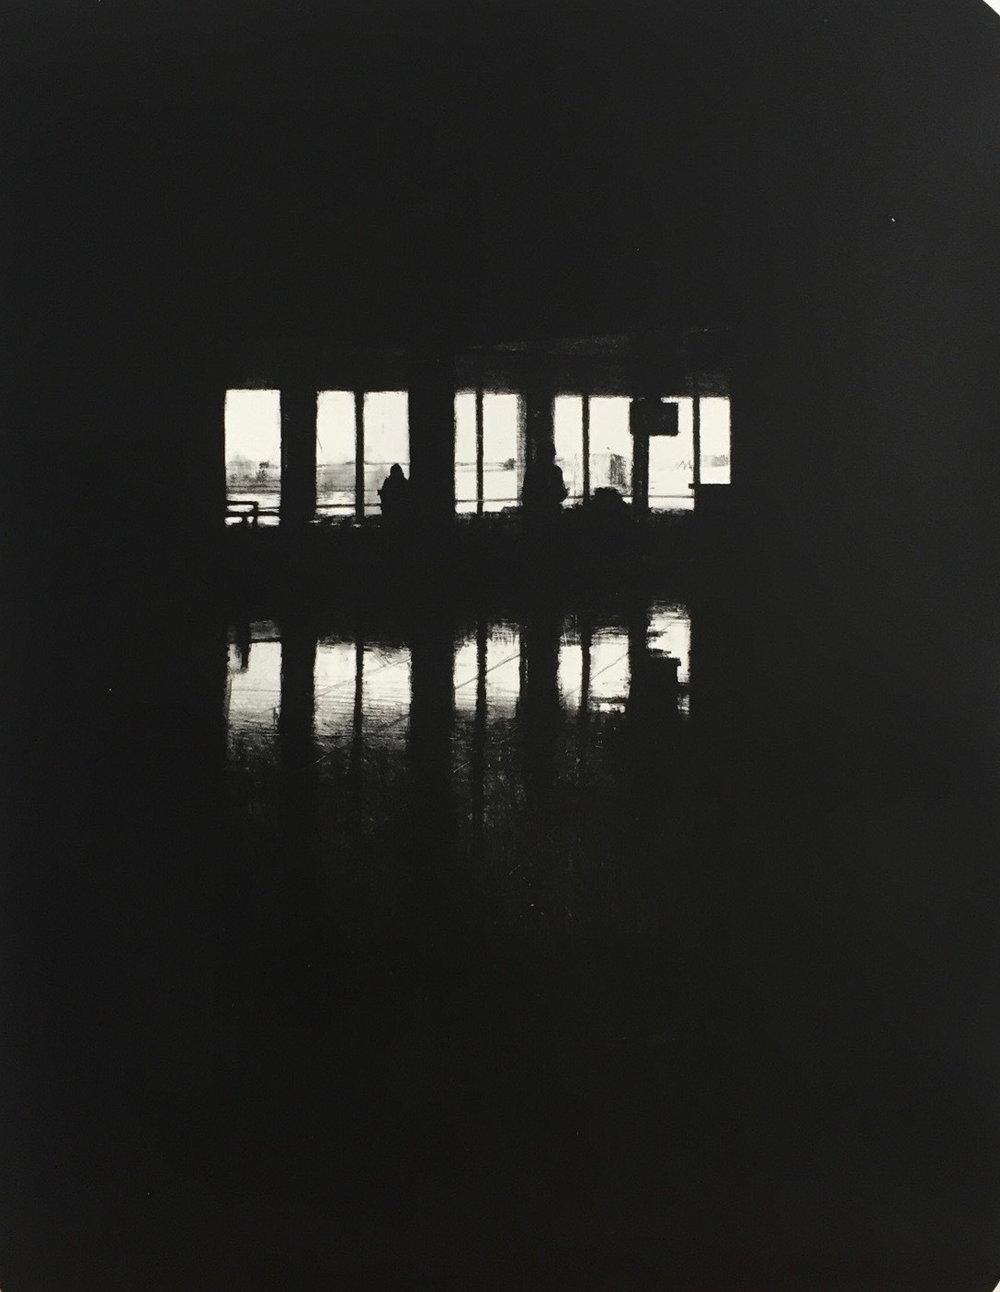 Departures III (JFK), 2016, lithograph, 55cm x 75cm, Ed. 15